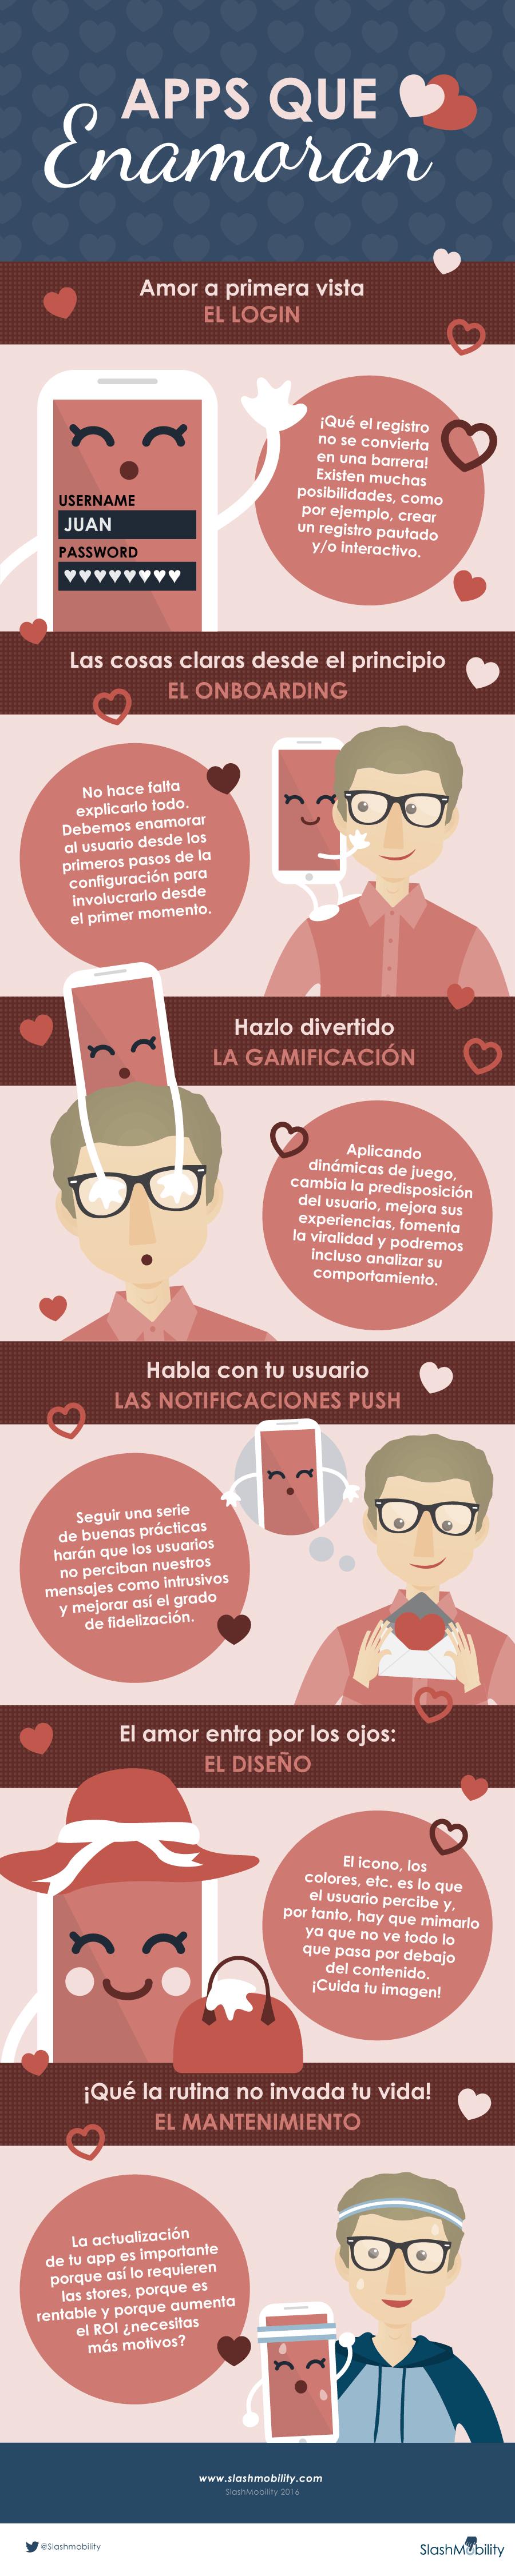 apps-enamorar